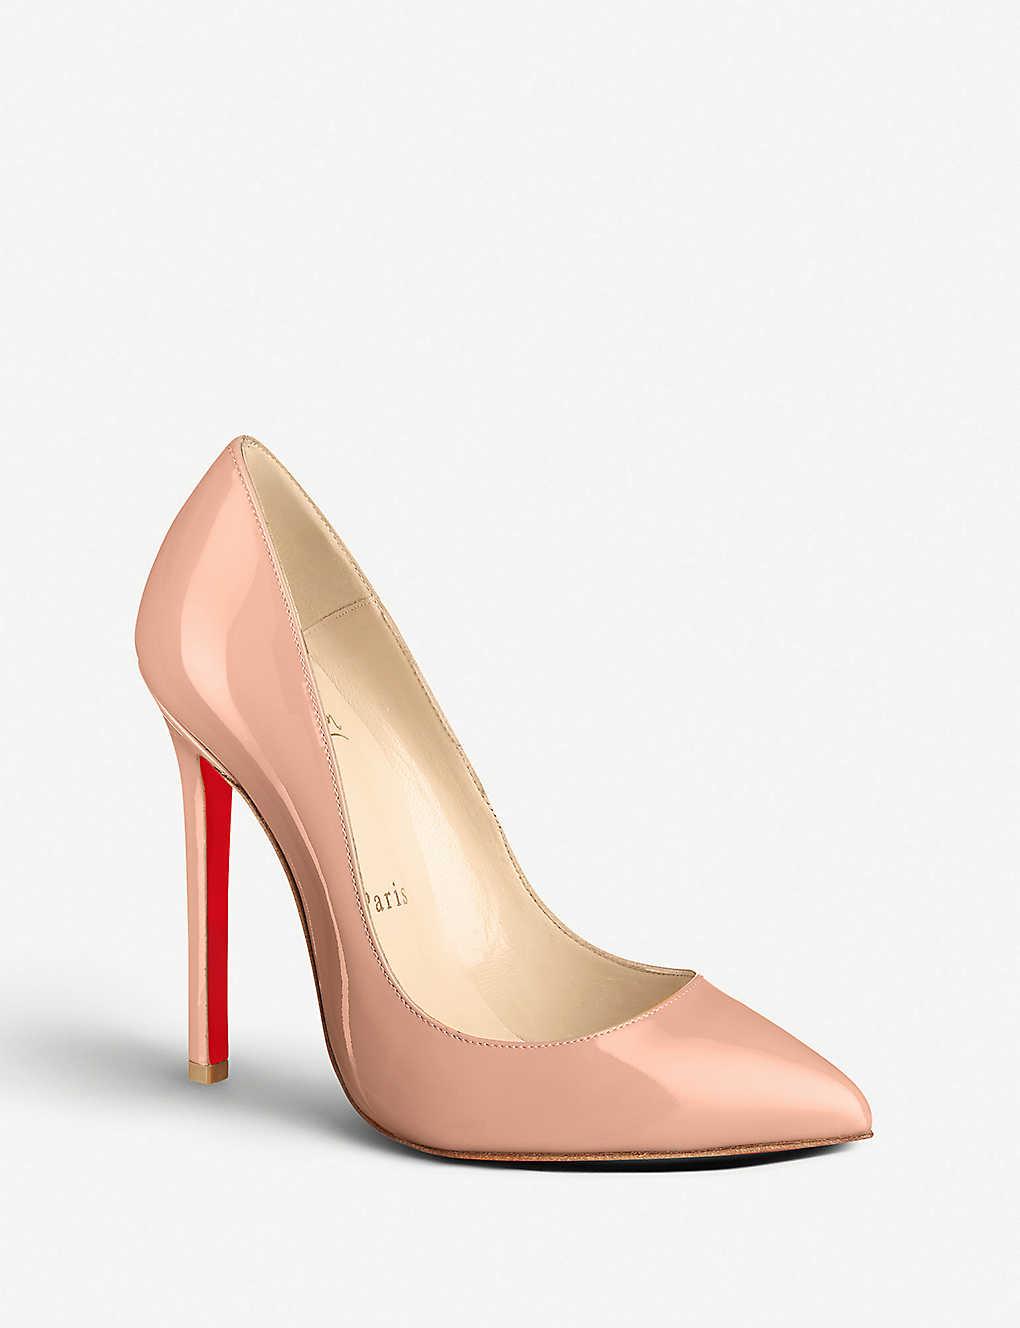 43ea63fe0c6d CHRISTIAN LOUBOUTIN - Pigalle 120 patent calf